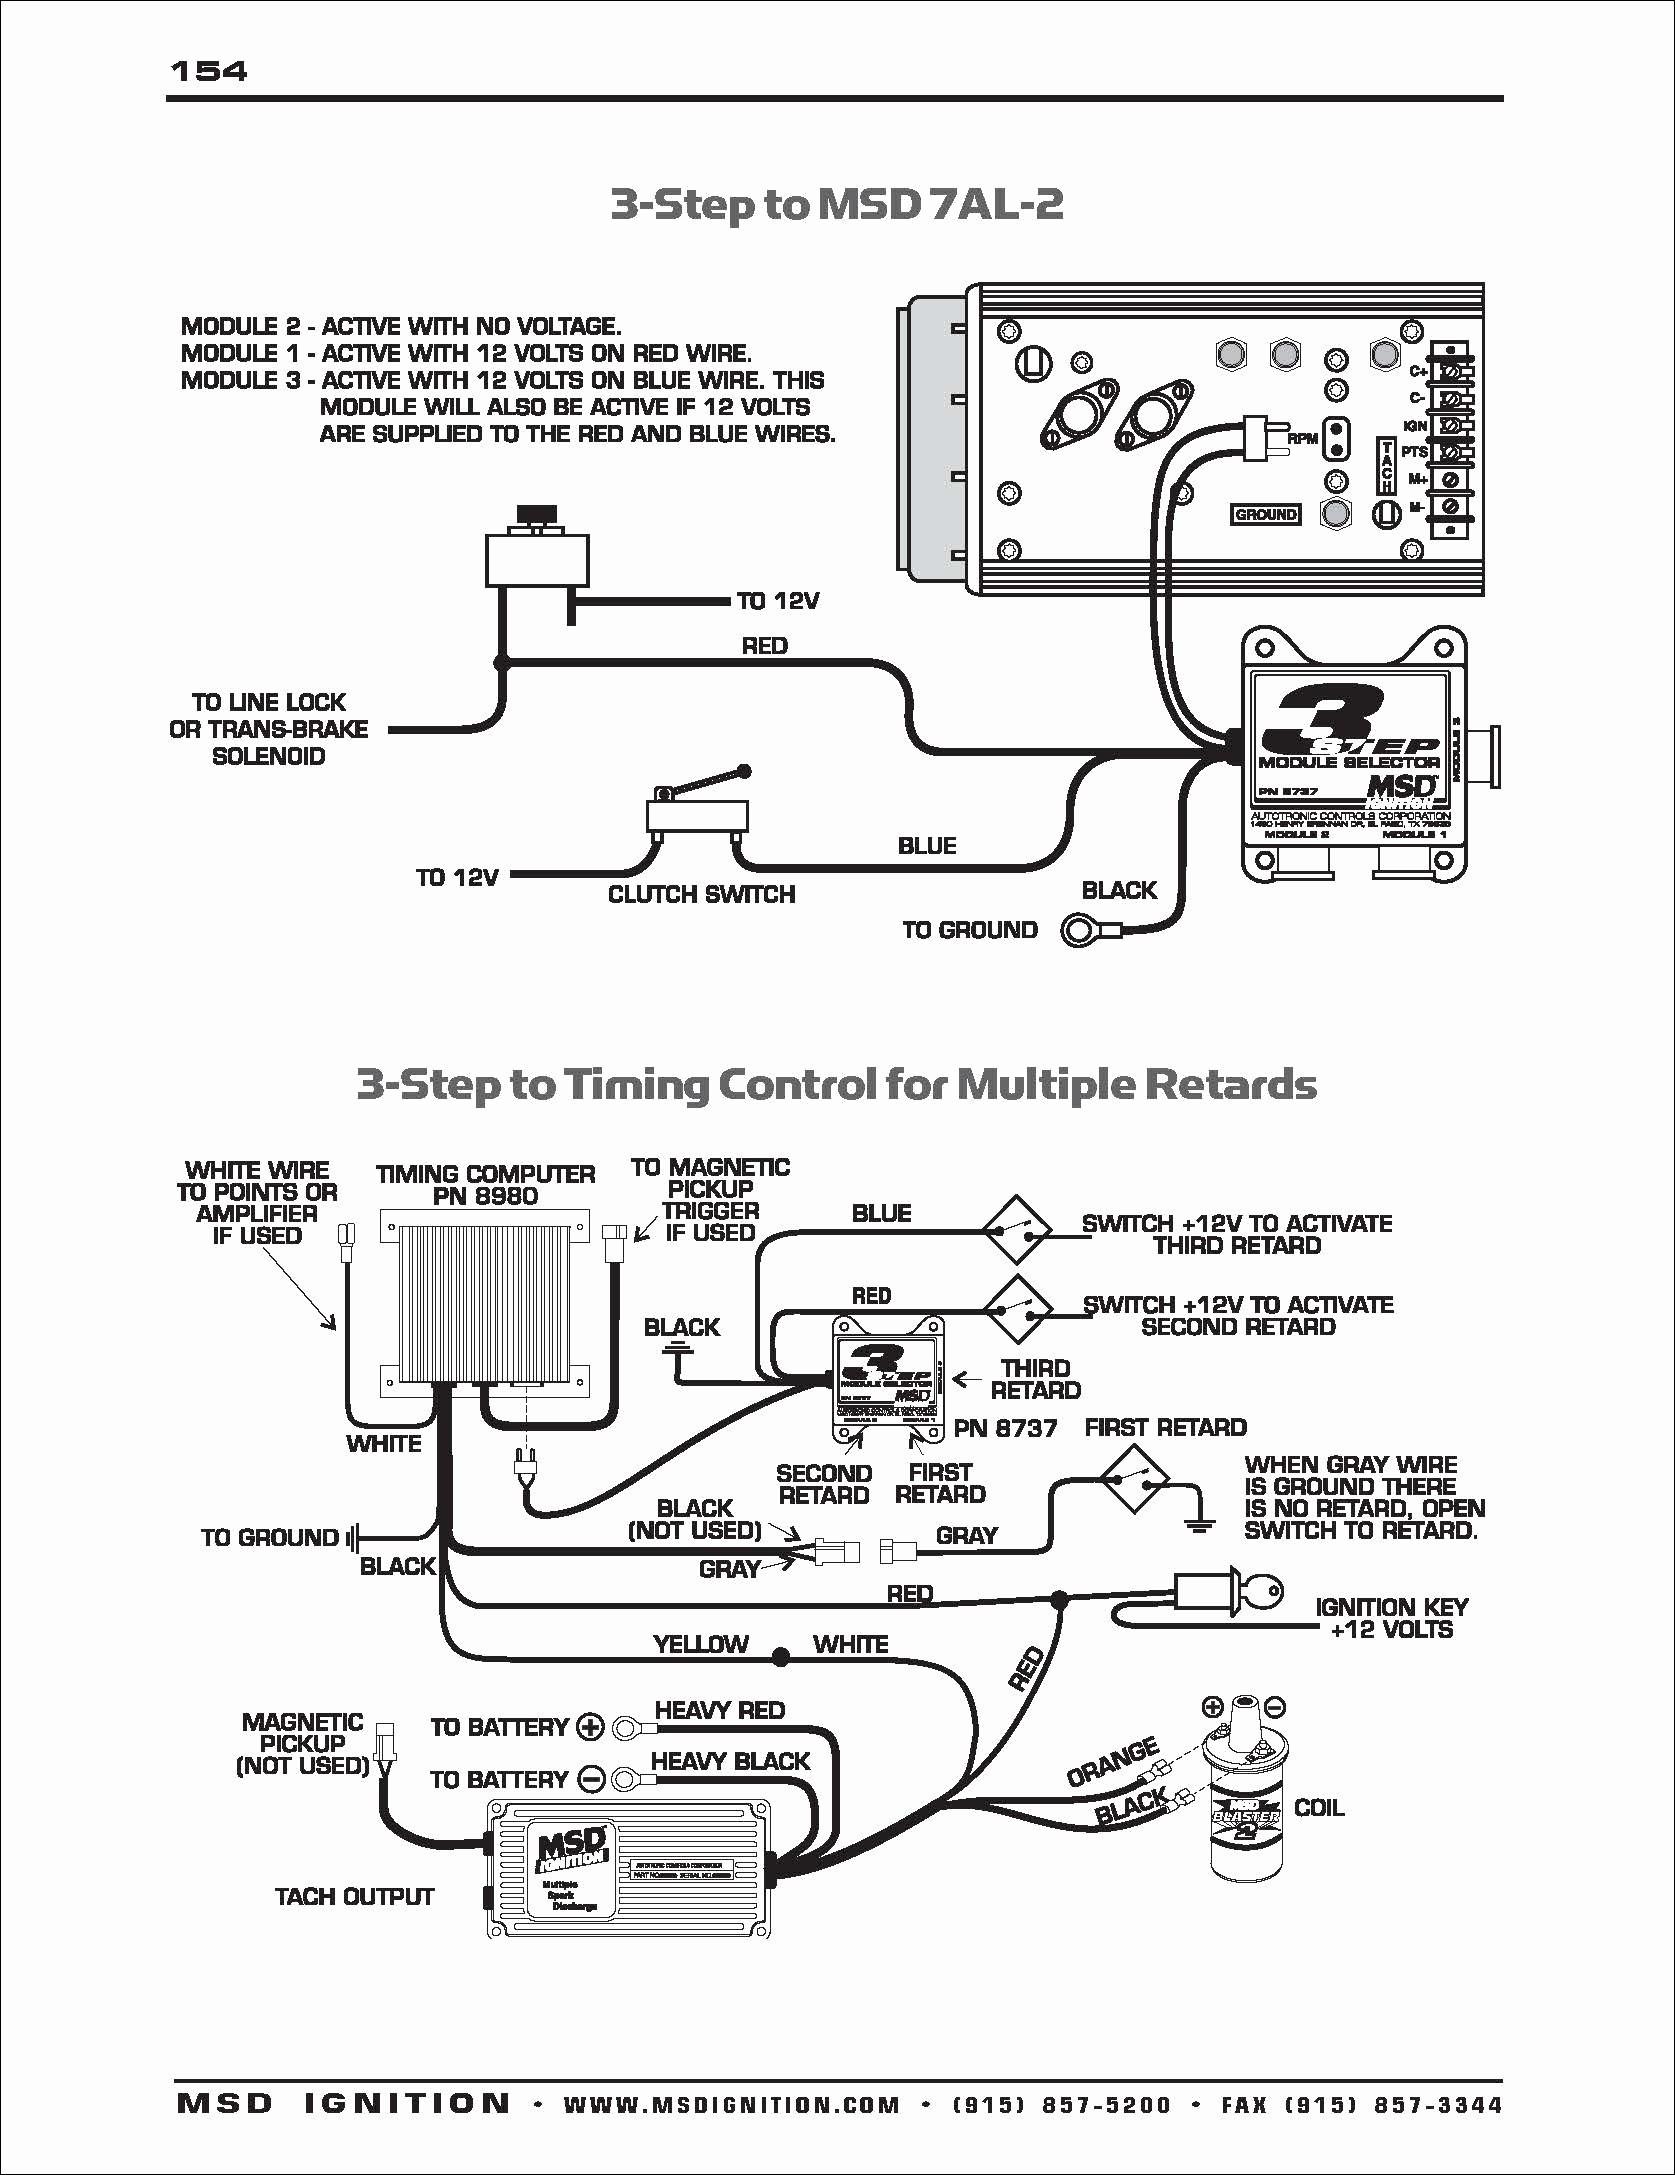 Diagram Of A Lawn Mower Engine Basic Mower Wiring Diagrams Of Diagram Of A Lawn Mower Engine